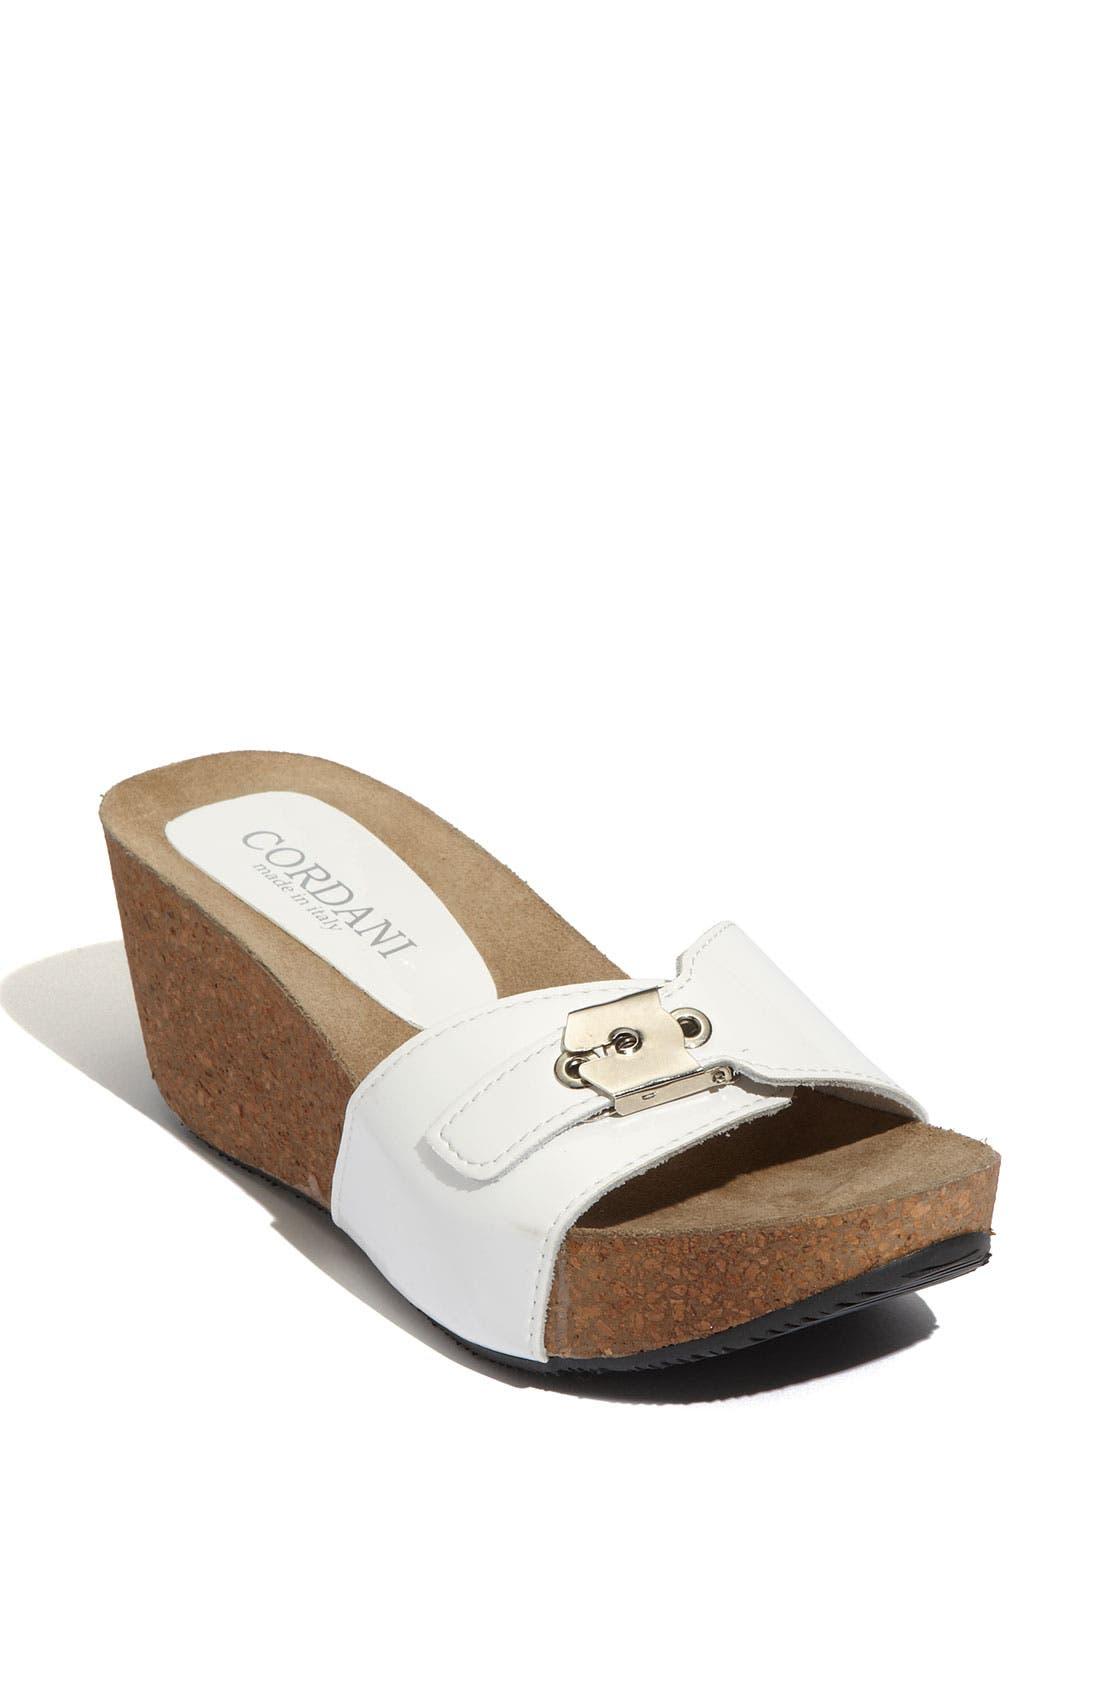 Main Image - Cordani 'Aries' Sandal